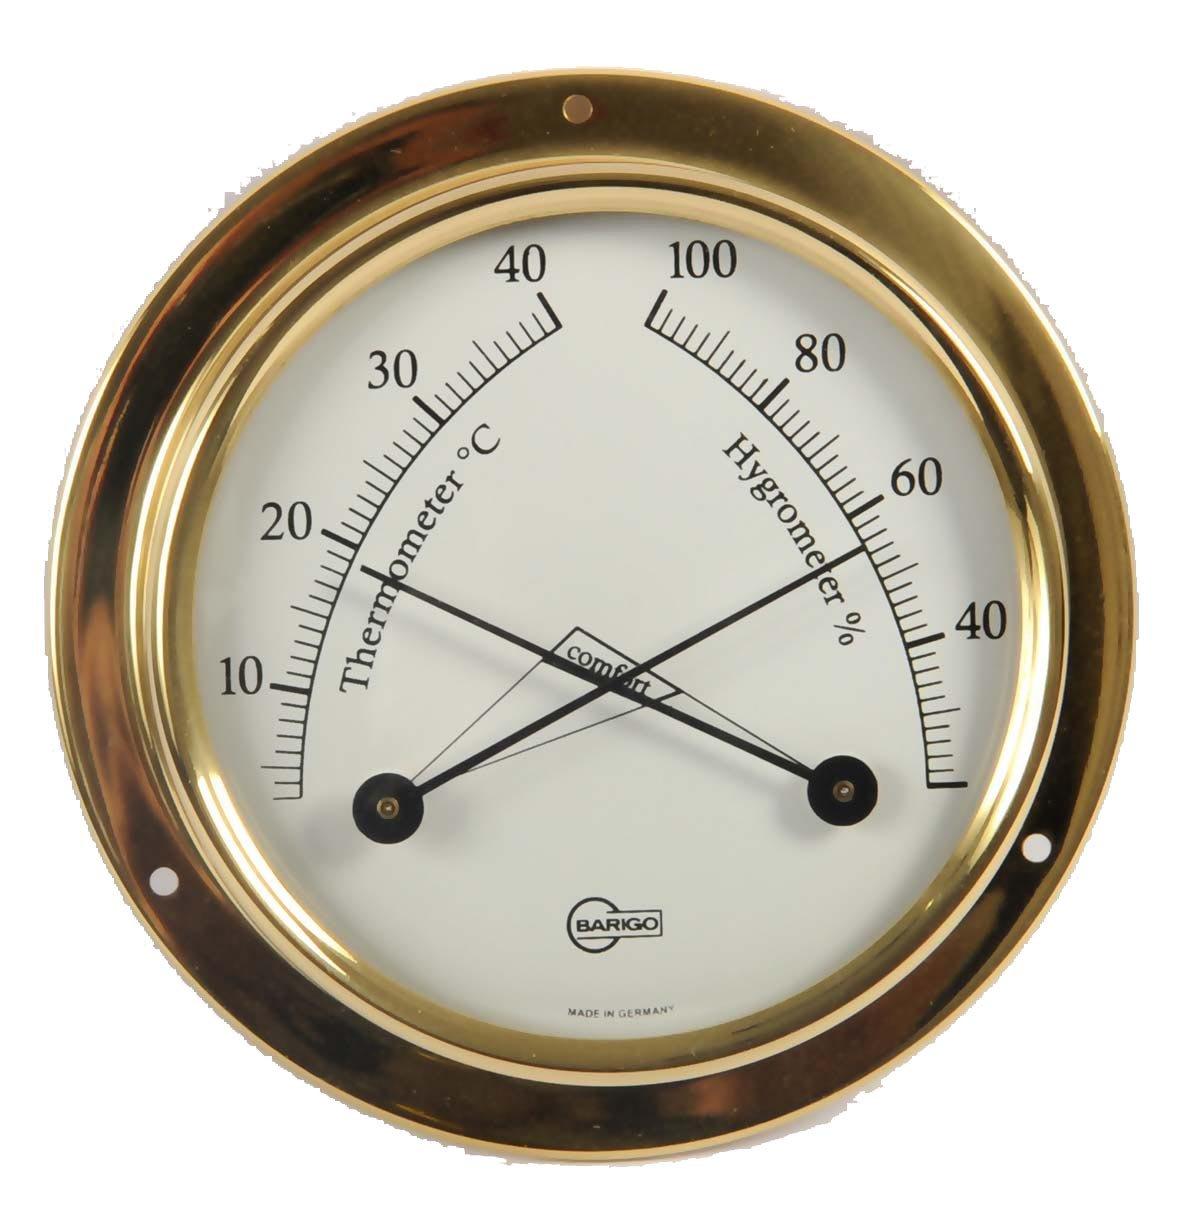 Thermohygrometer Thermometer Hygrometer Raumklima Analog Temperaturmesser